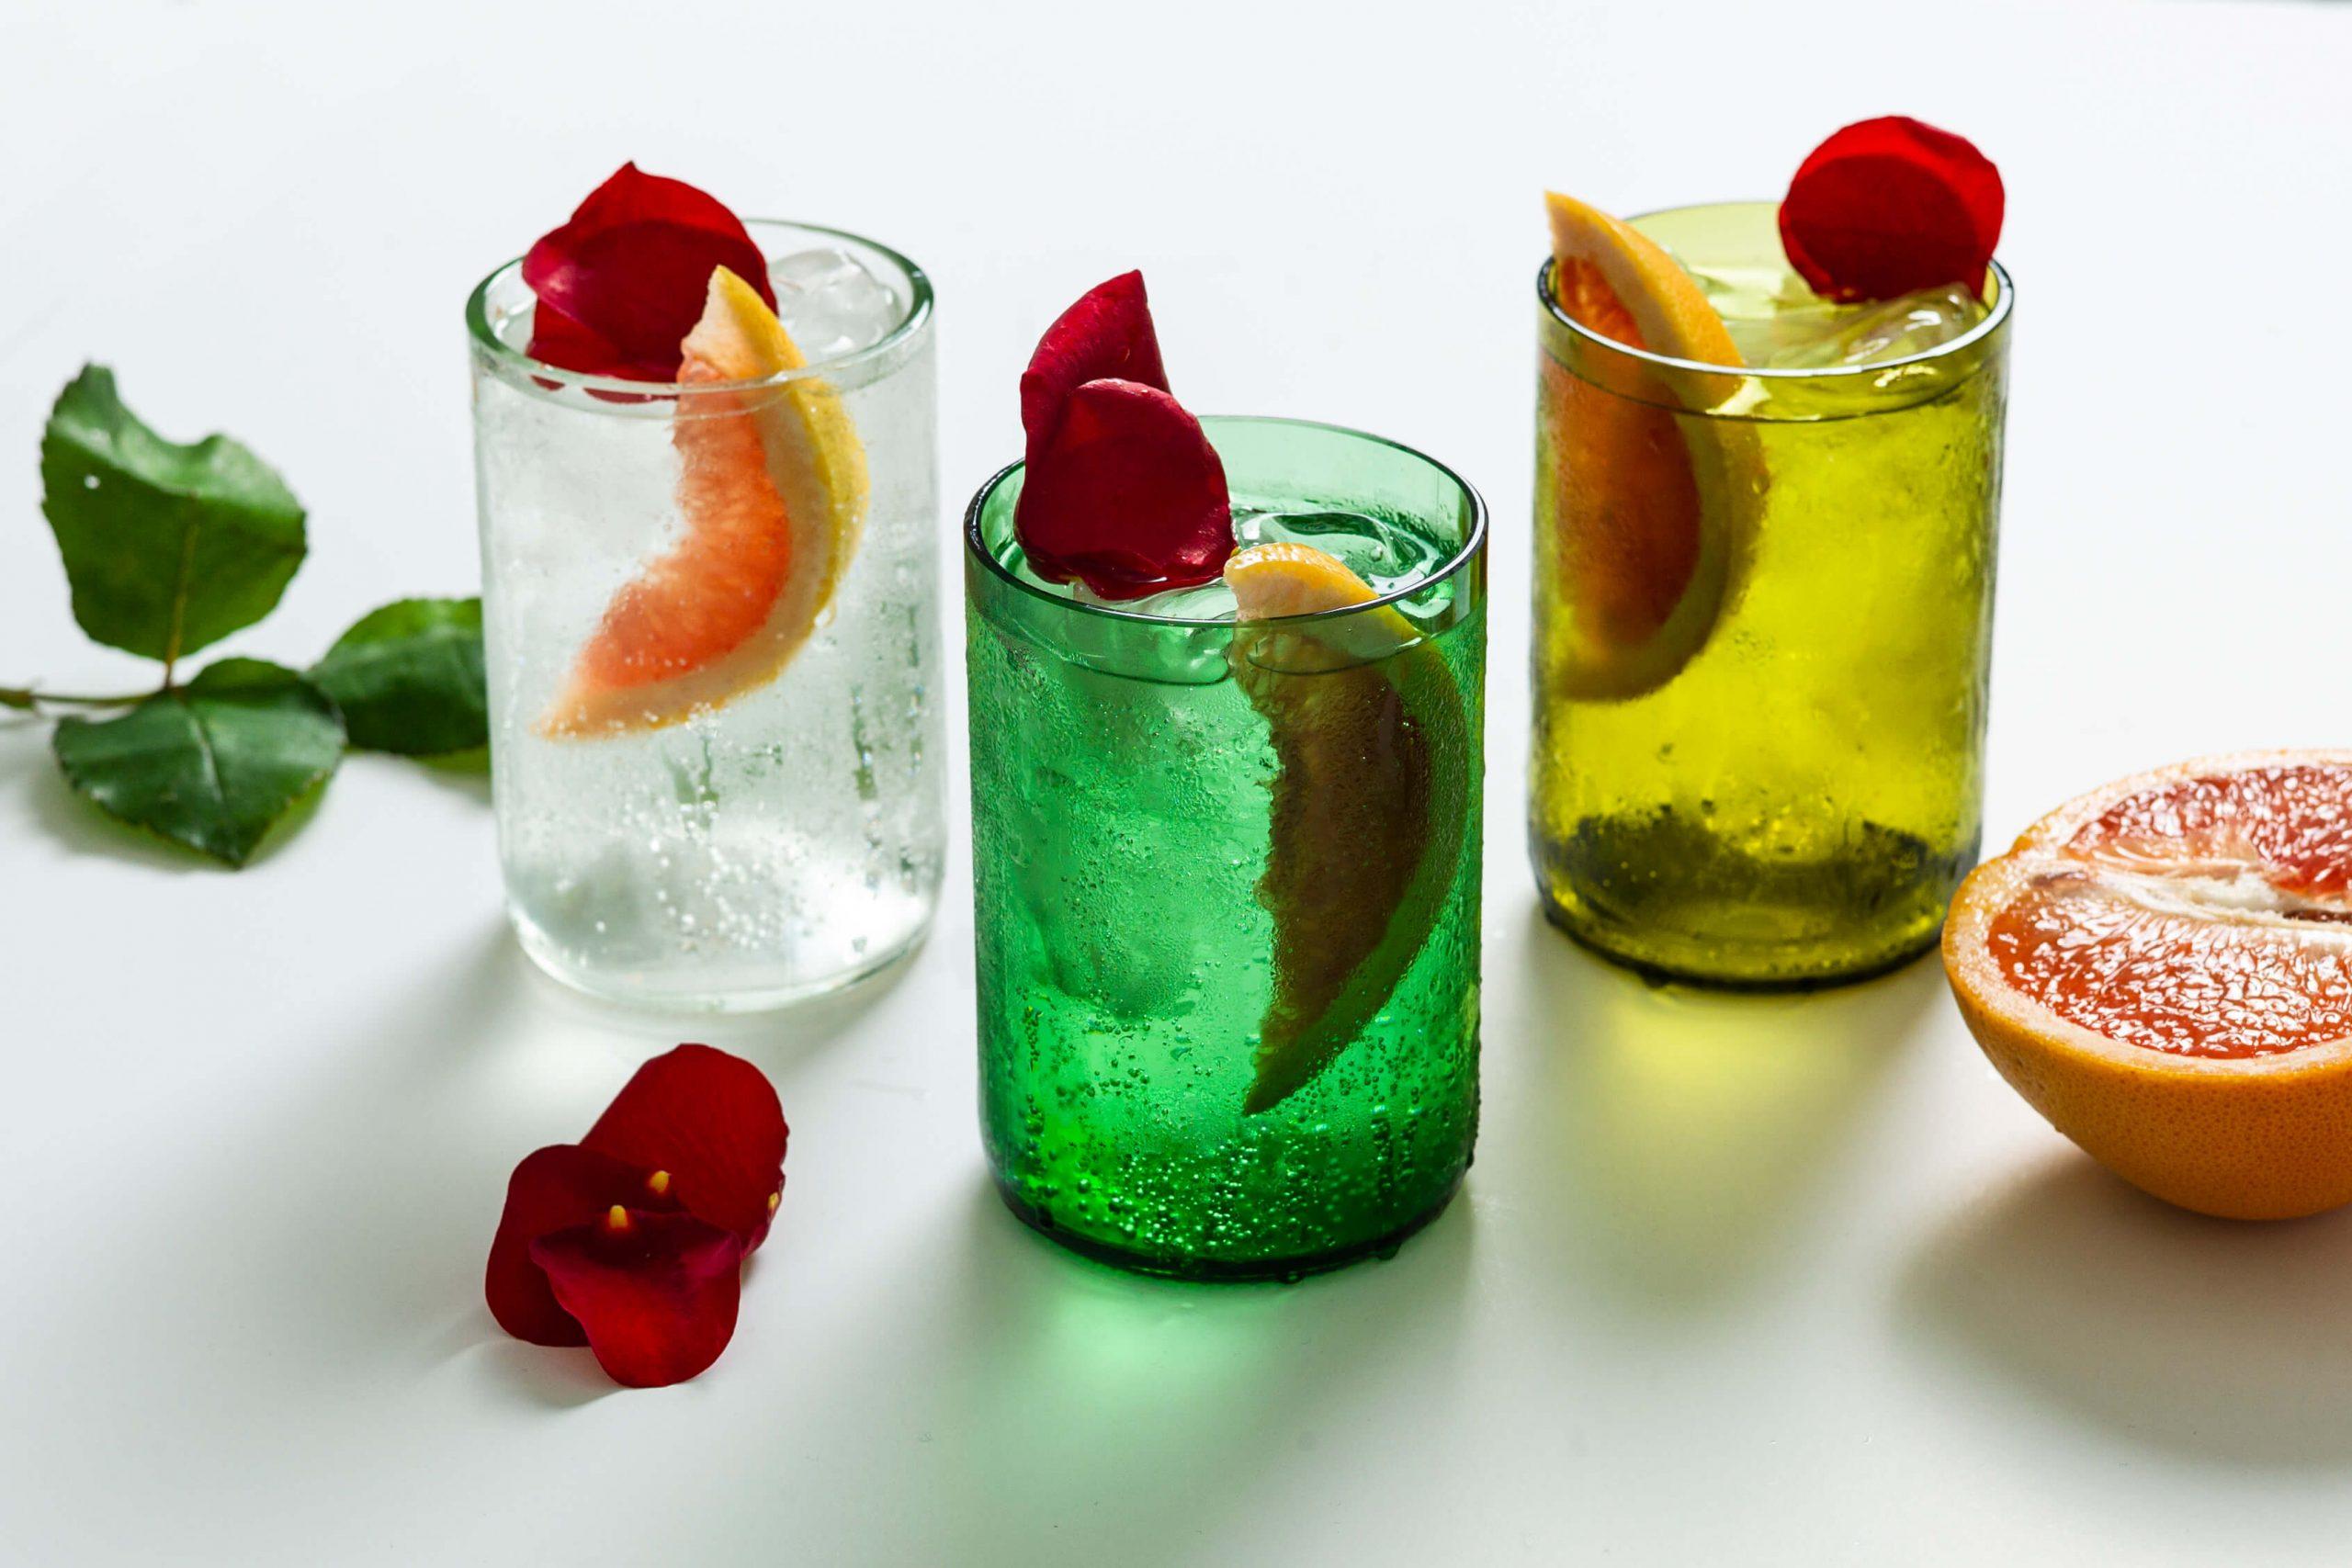 Rebottled glazen verschillende kleuren duurzaam design